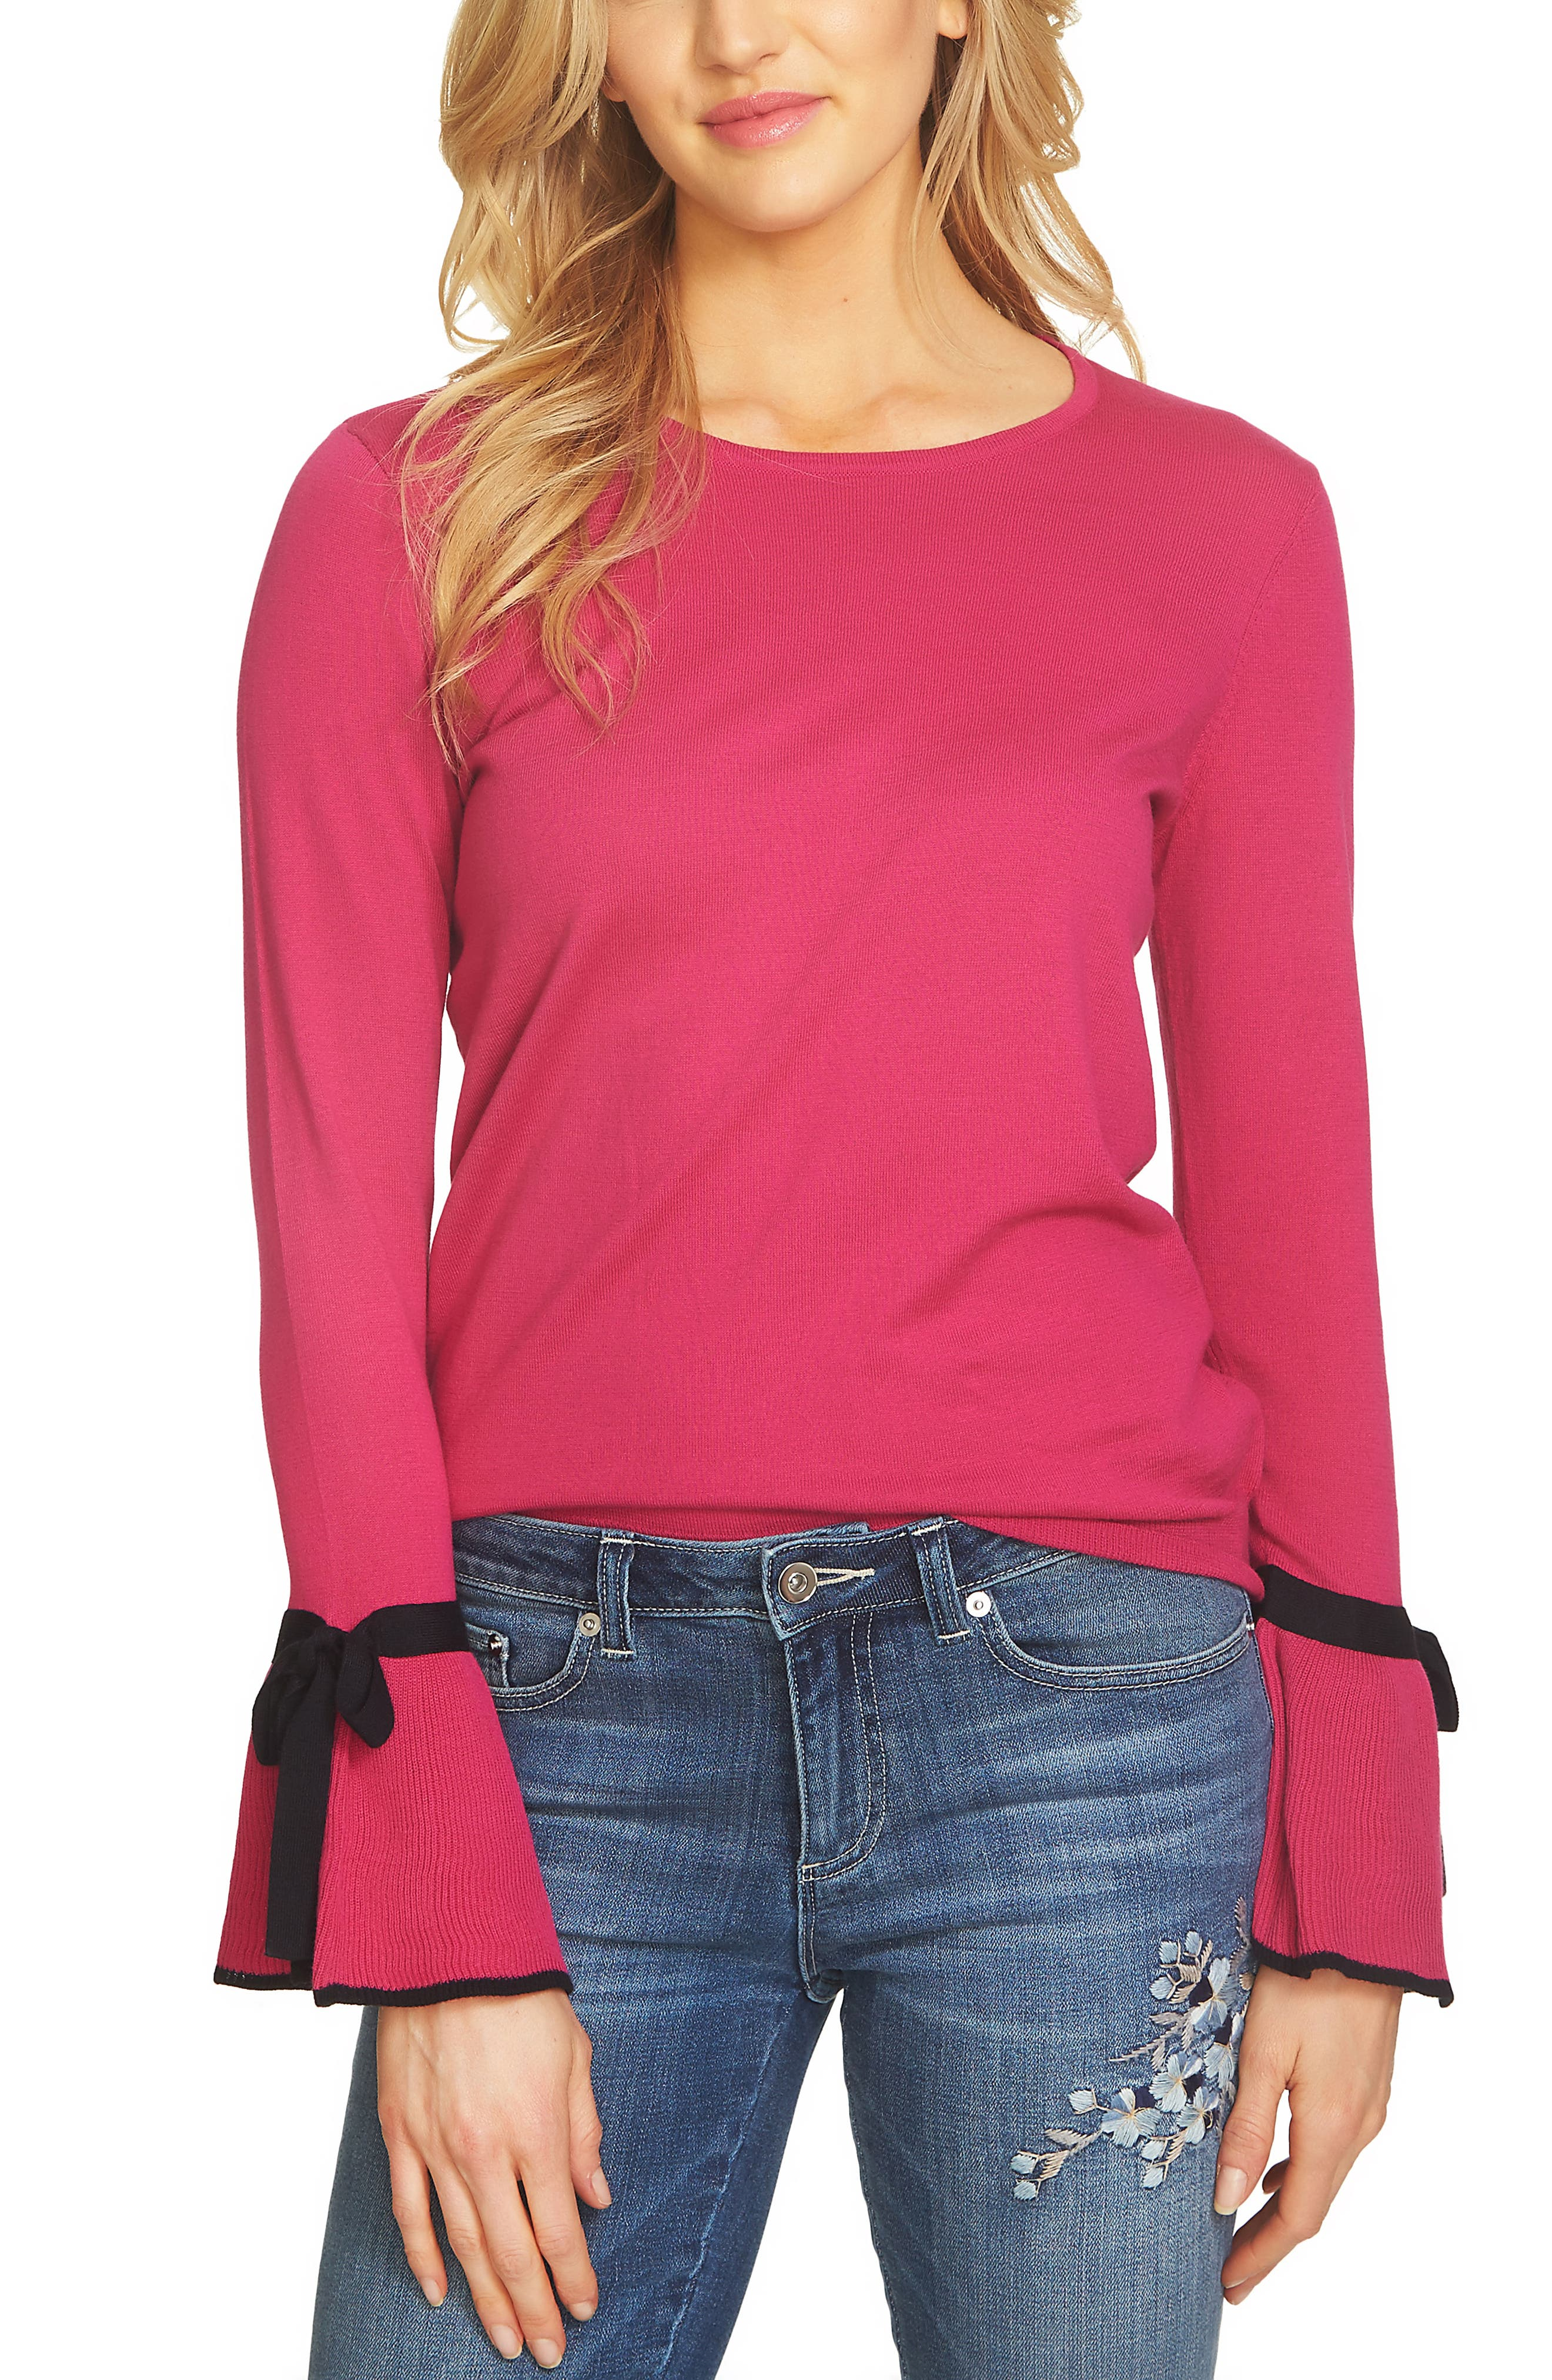 Main Image - CeCe Bow Cuff Sweater